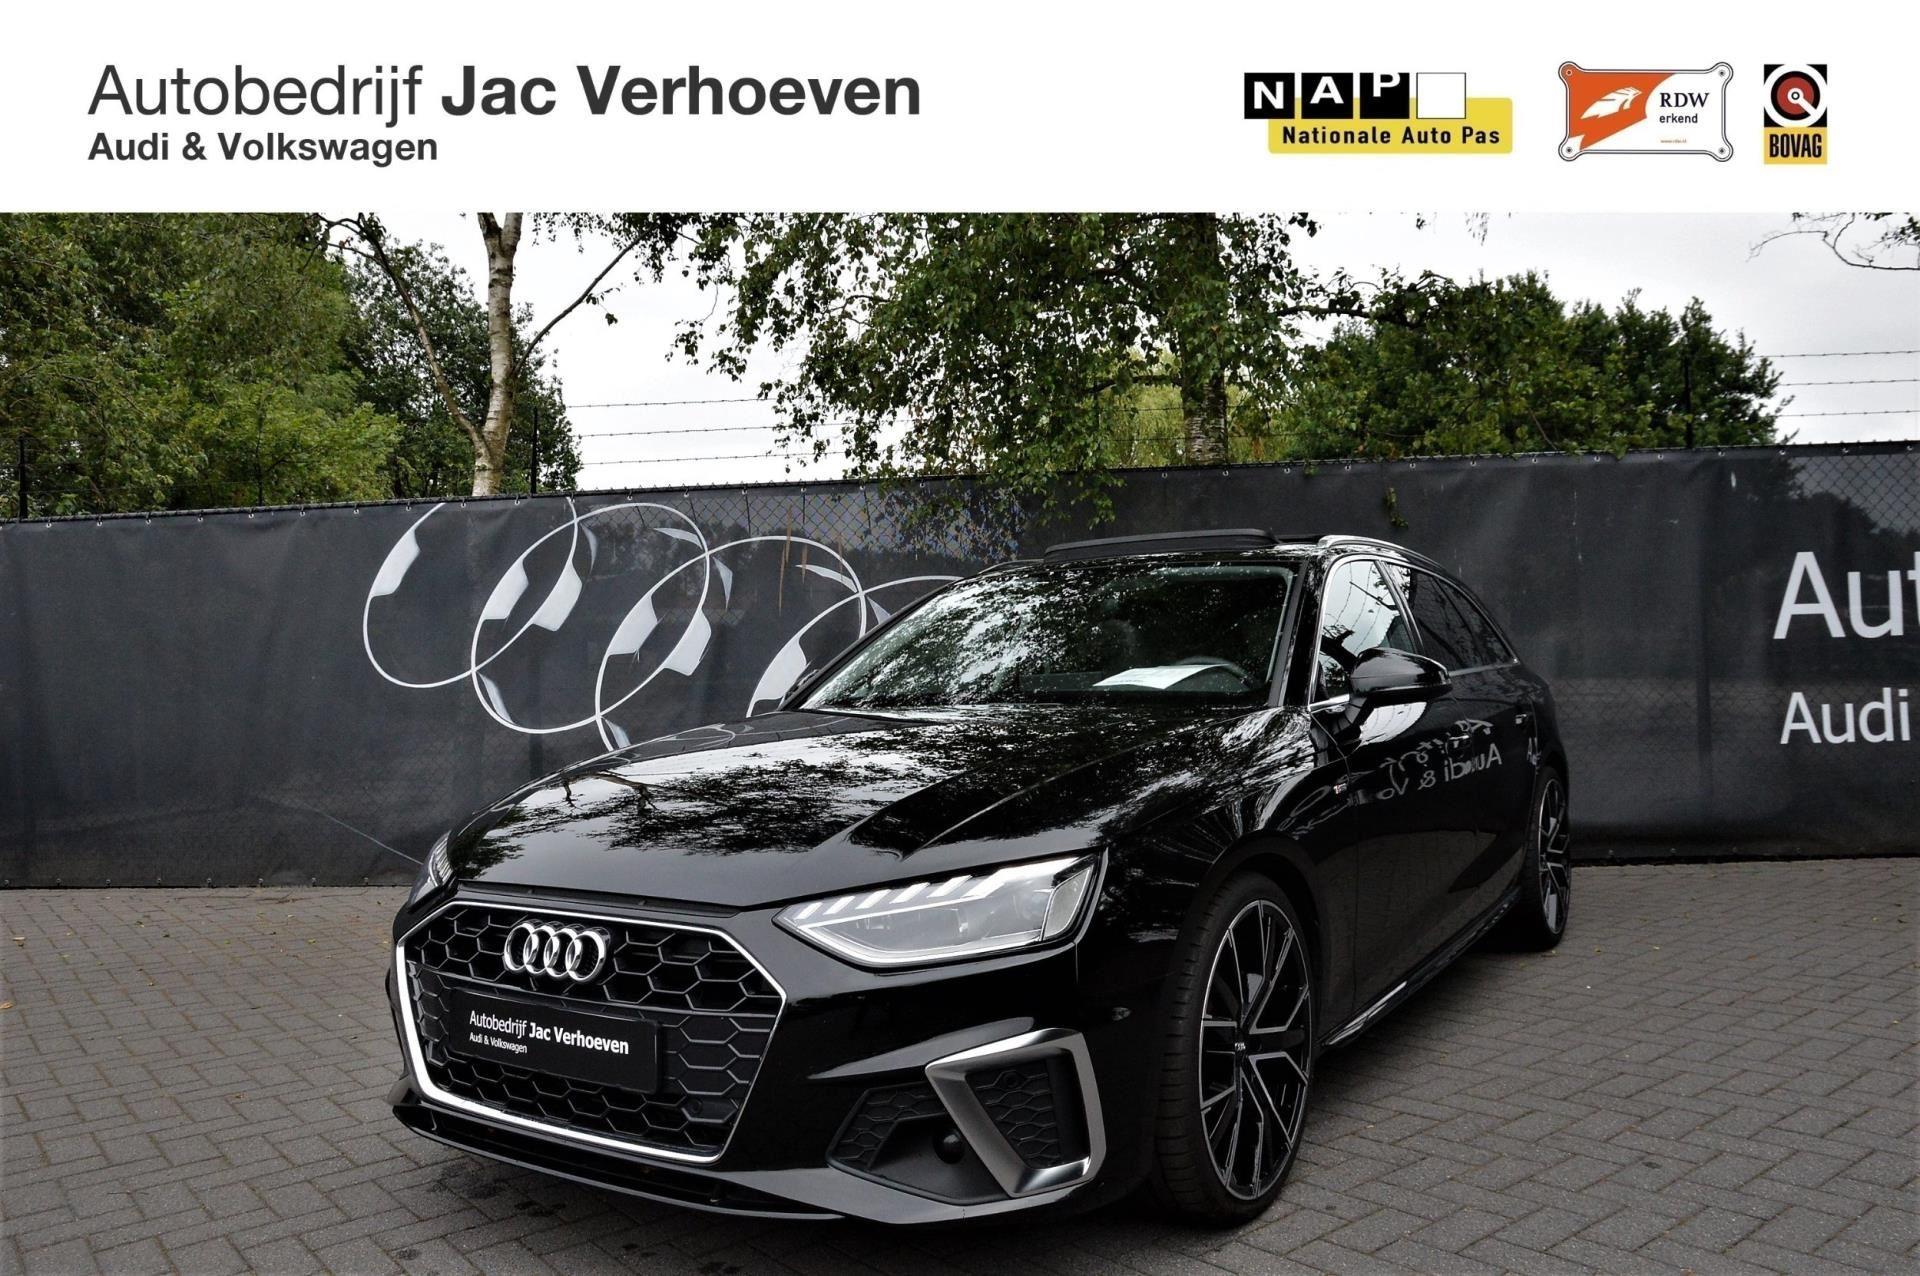 Audi A4 Avant occasion - Autobedrijf Jac Verhoeven